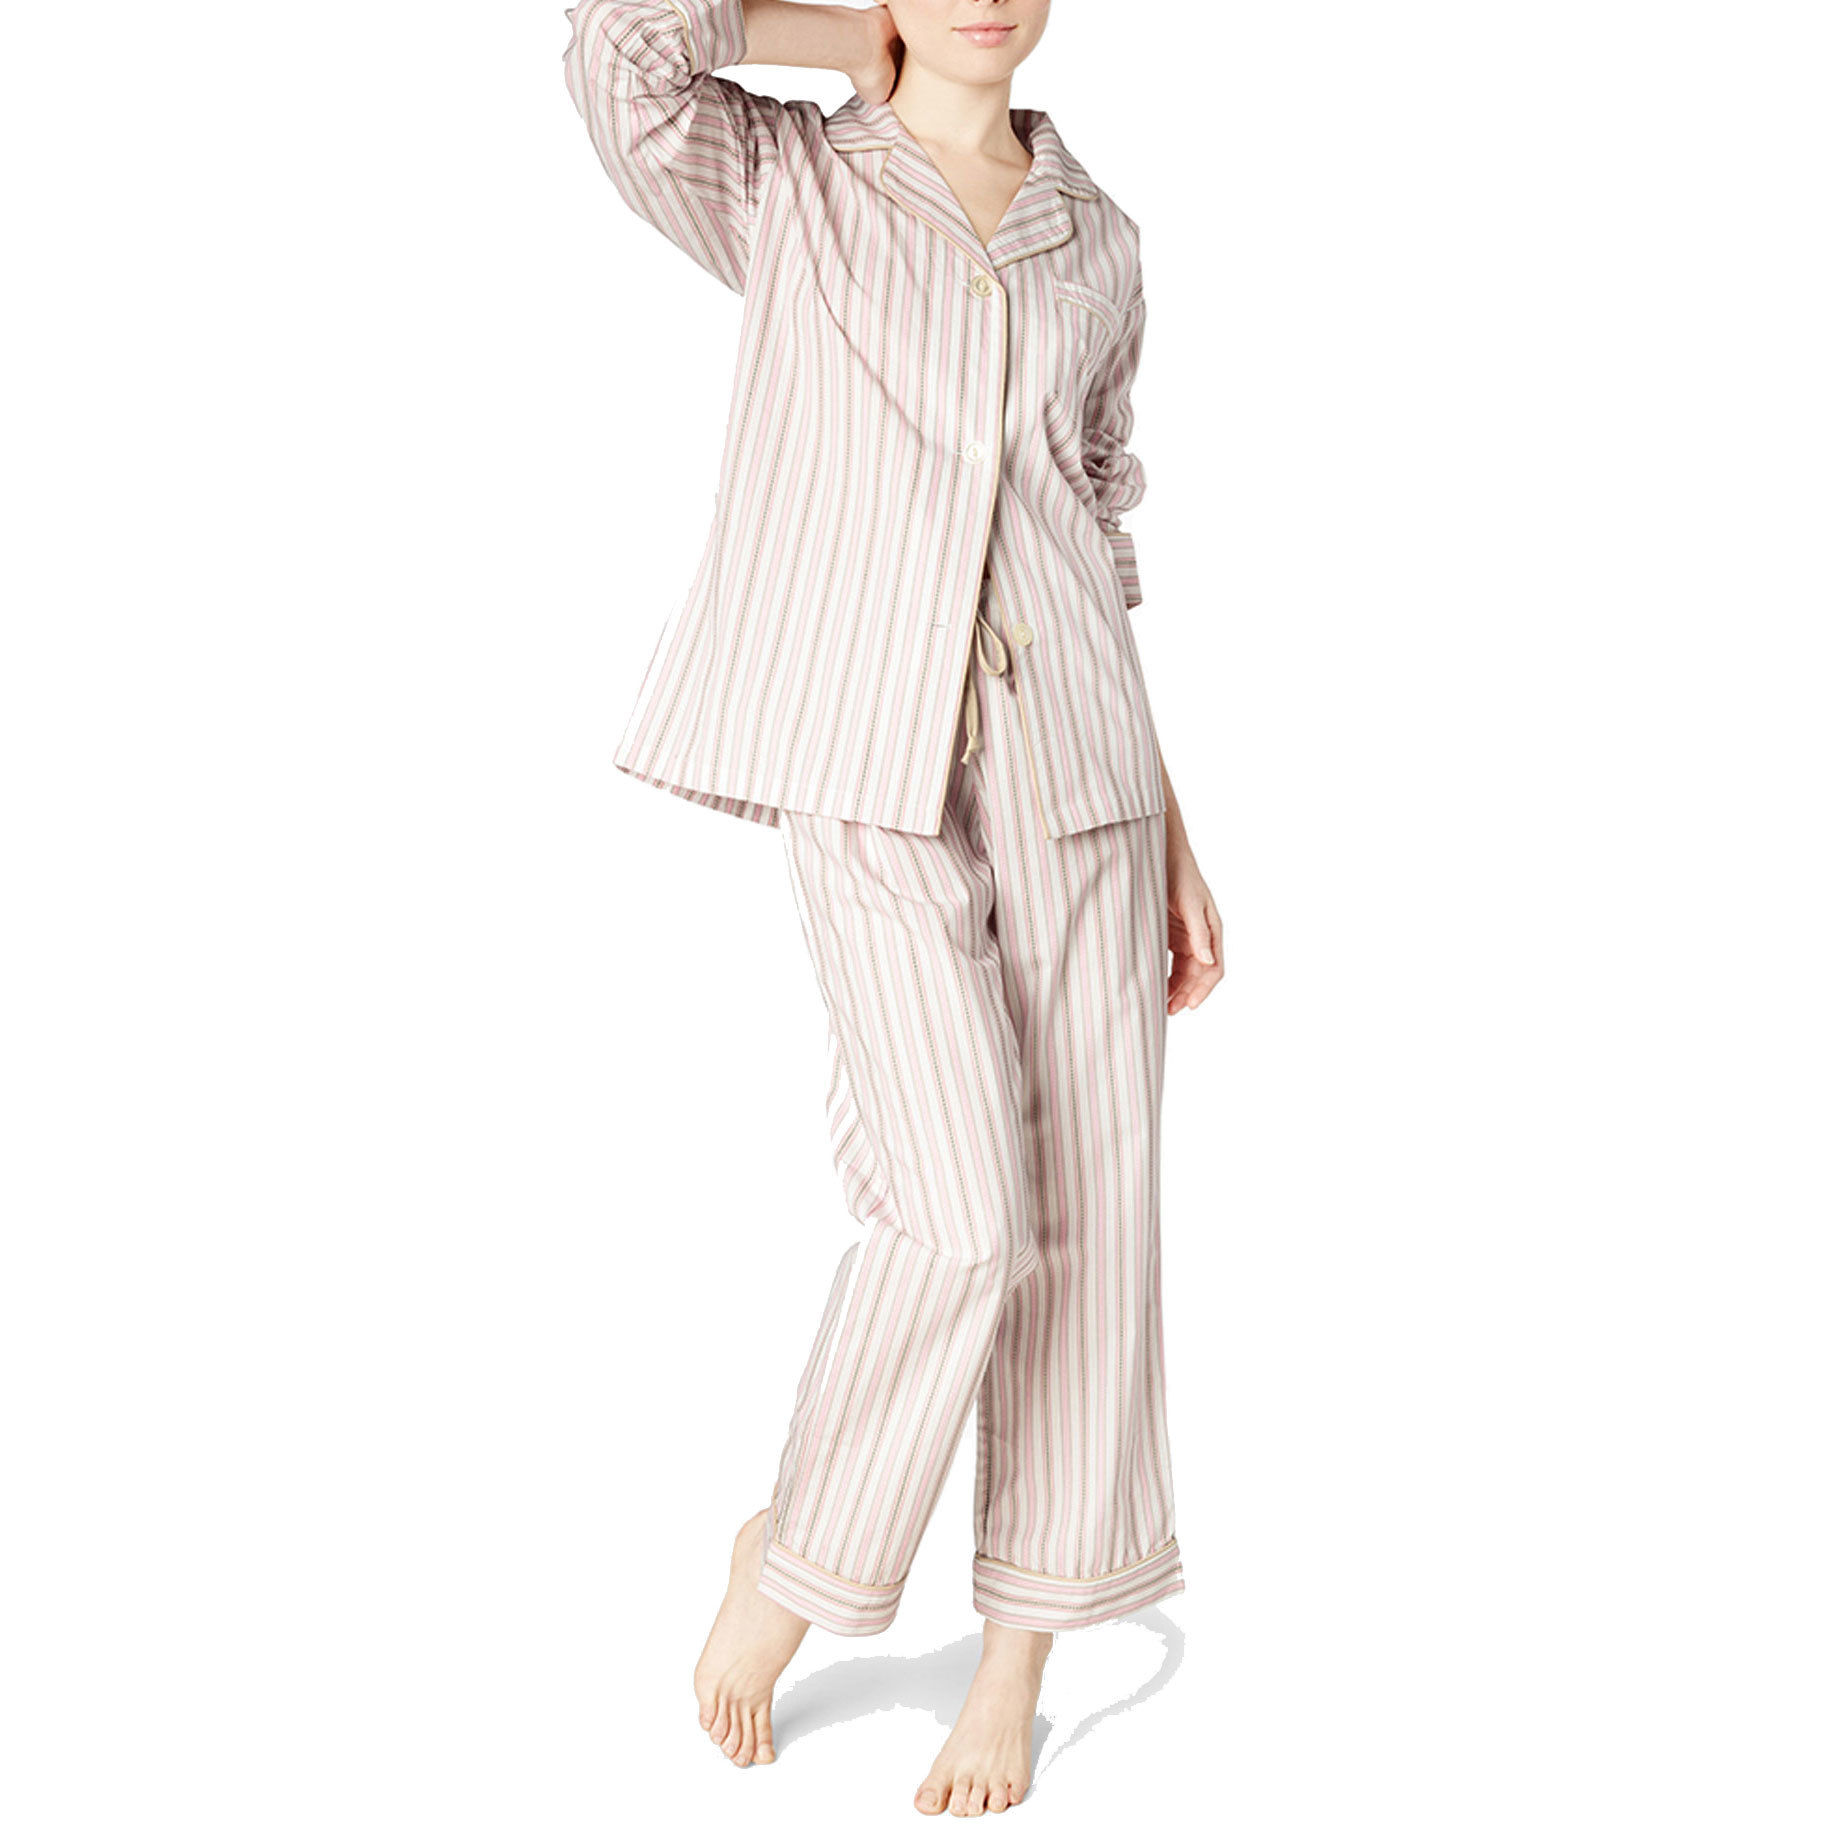 [SALE] BedHead Pajamas レディースコットンパジャマ  Pink Rail Road Stripe